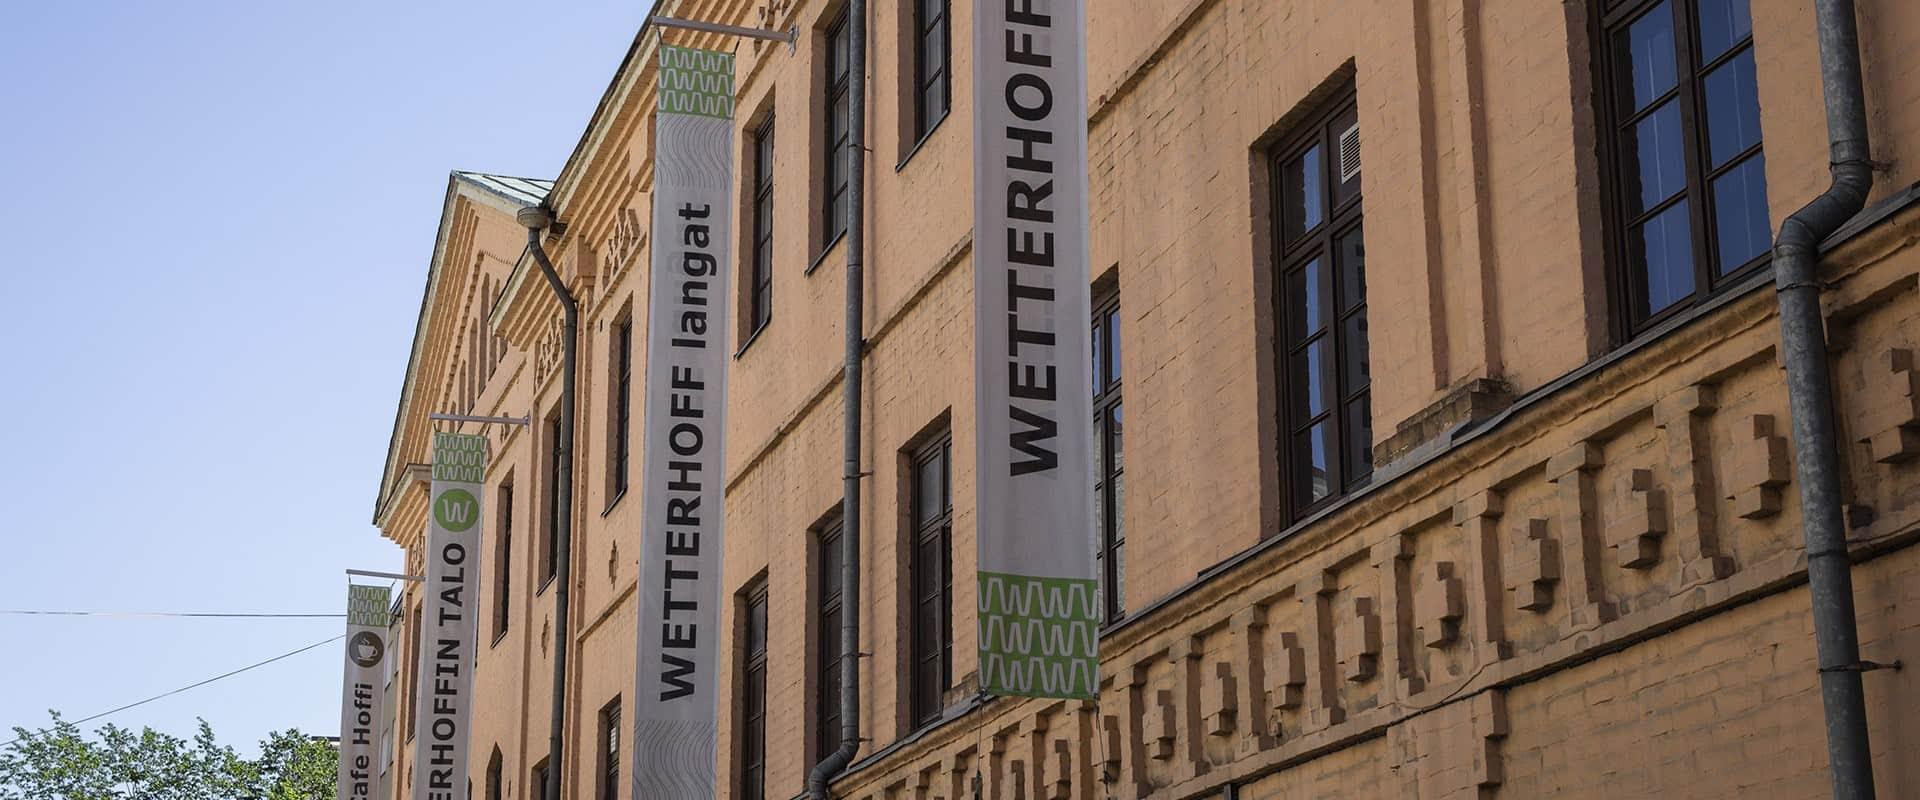 Visit Häme - kauppakeskus, shopping center